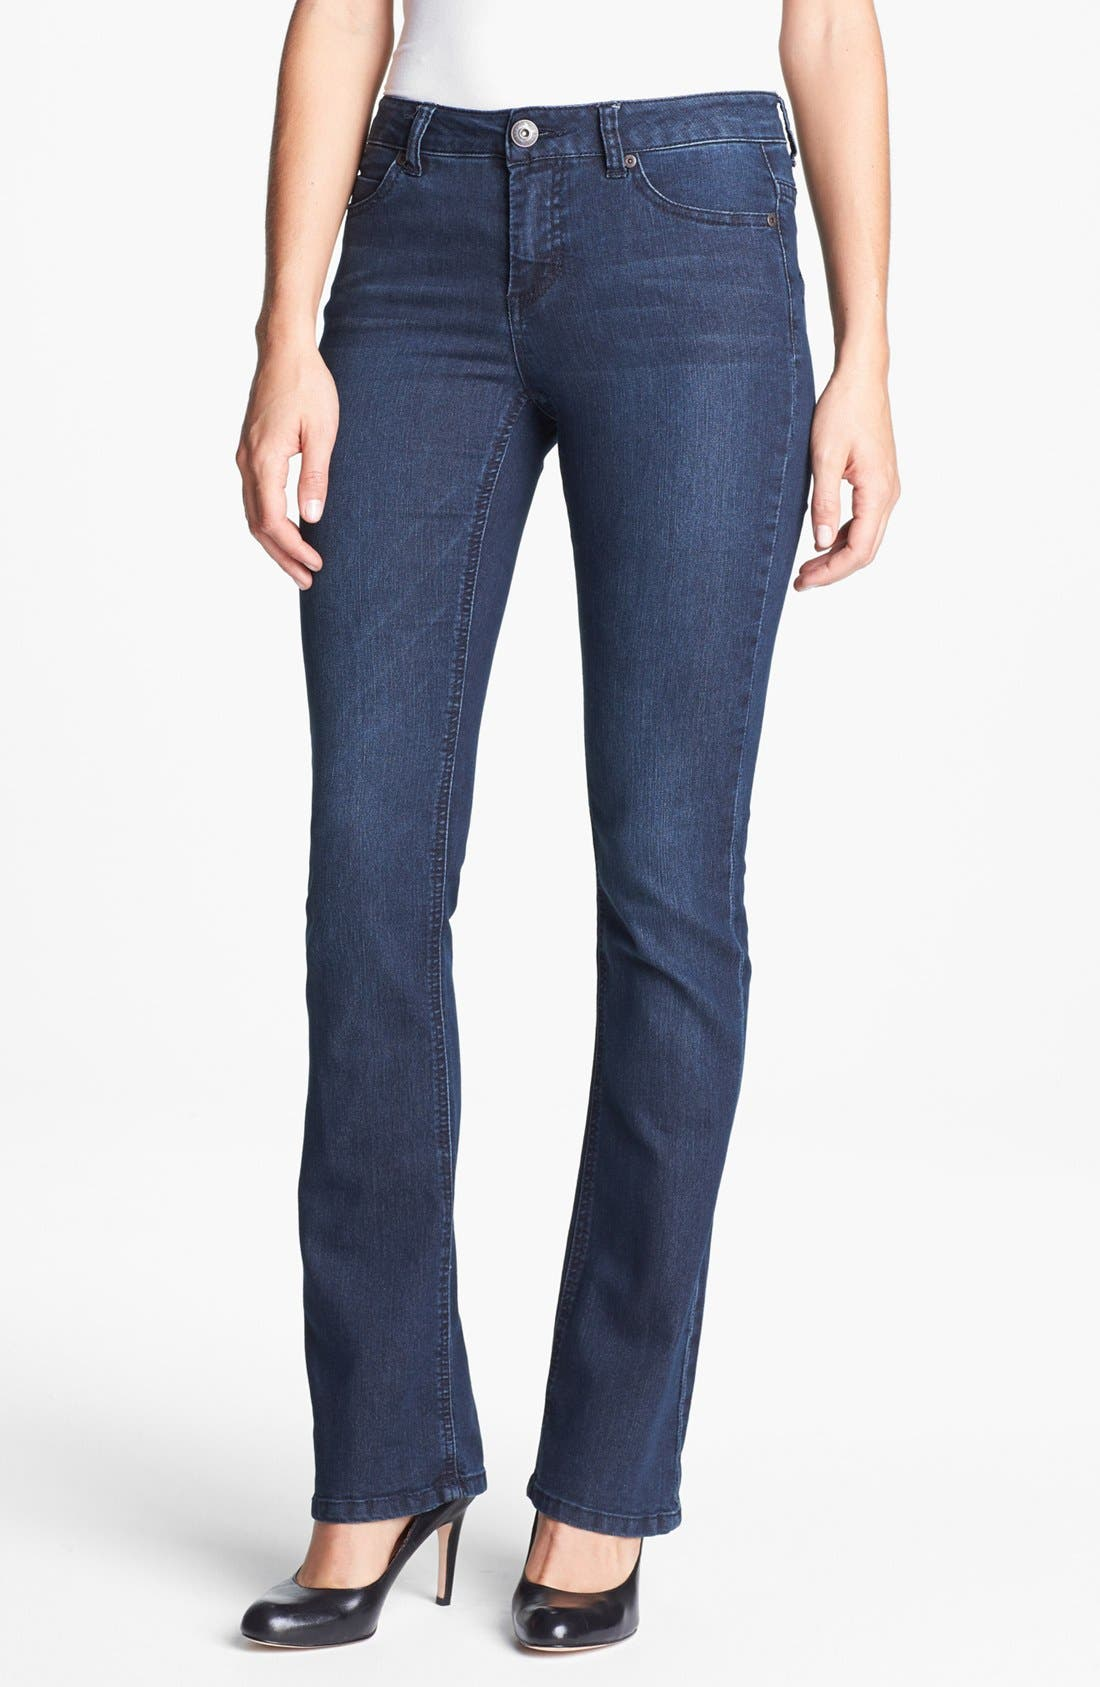 Main Image - Liverpool Jeans Company 'Rita' Bootcut Stretch Jeans (Petite)